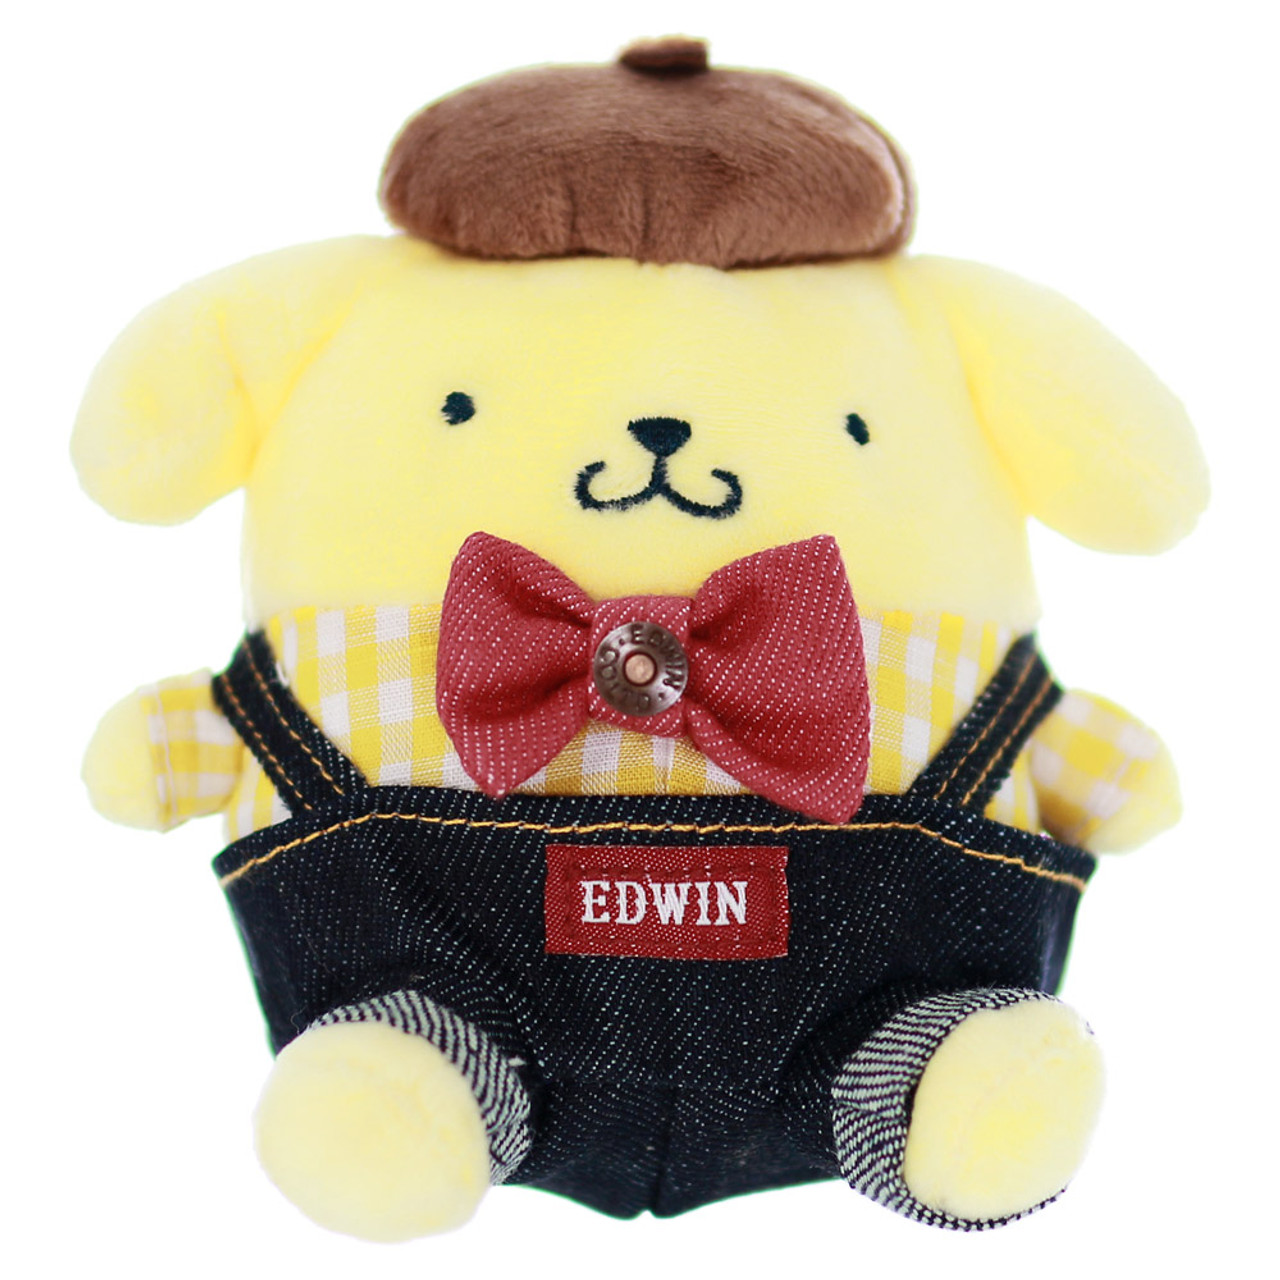 Sanrio PomPomPurin x Edwin Denim Dungarees Stuffed Animal Toy( Front View )